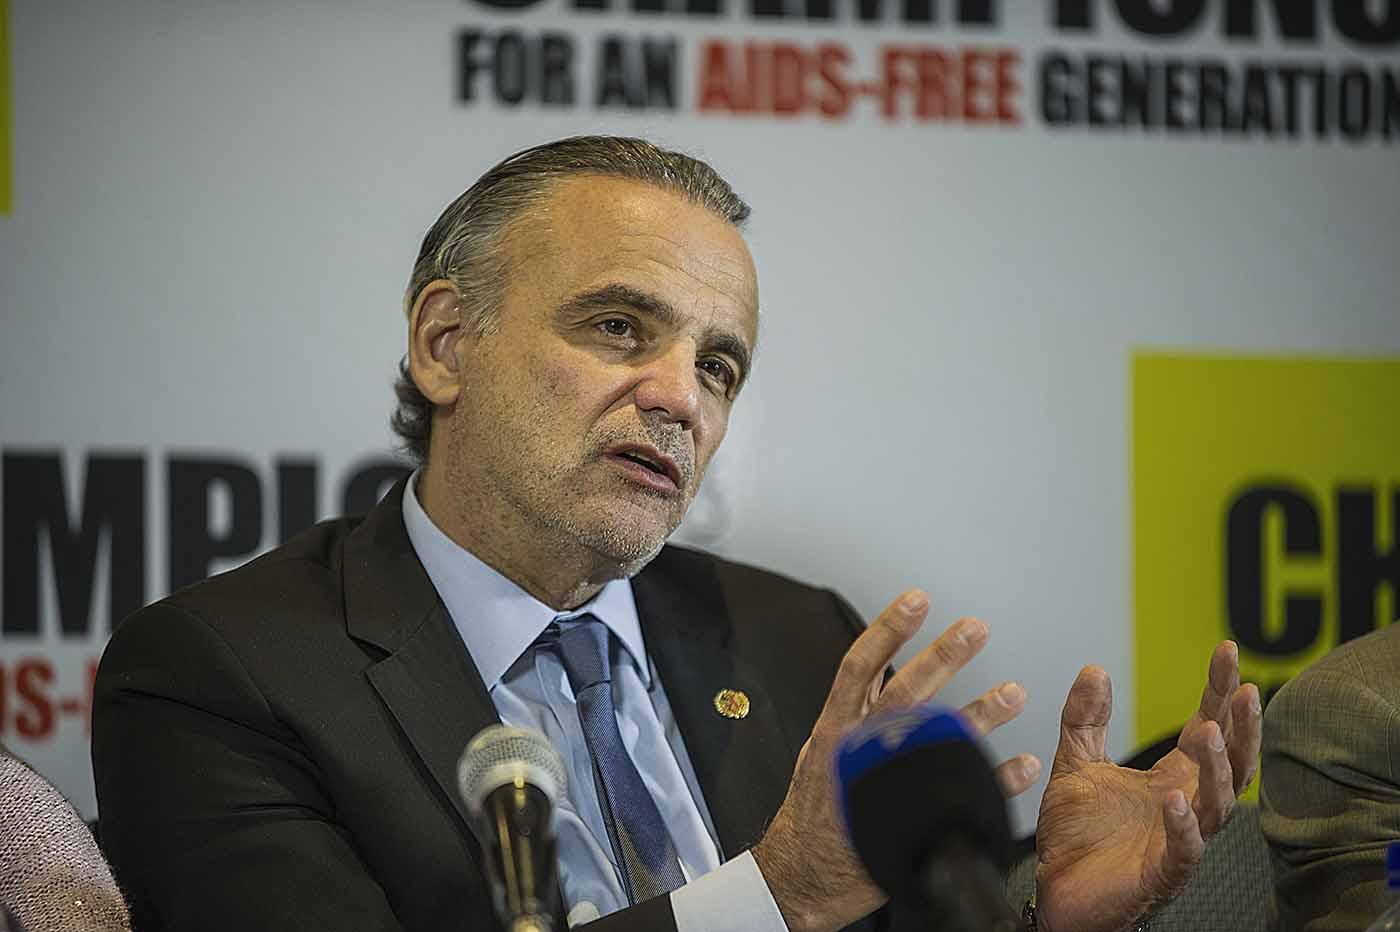 UNAIDS Deputy Executive Director, Luiz Loures, addresses the media.